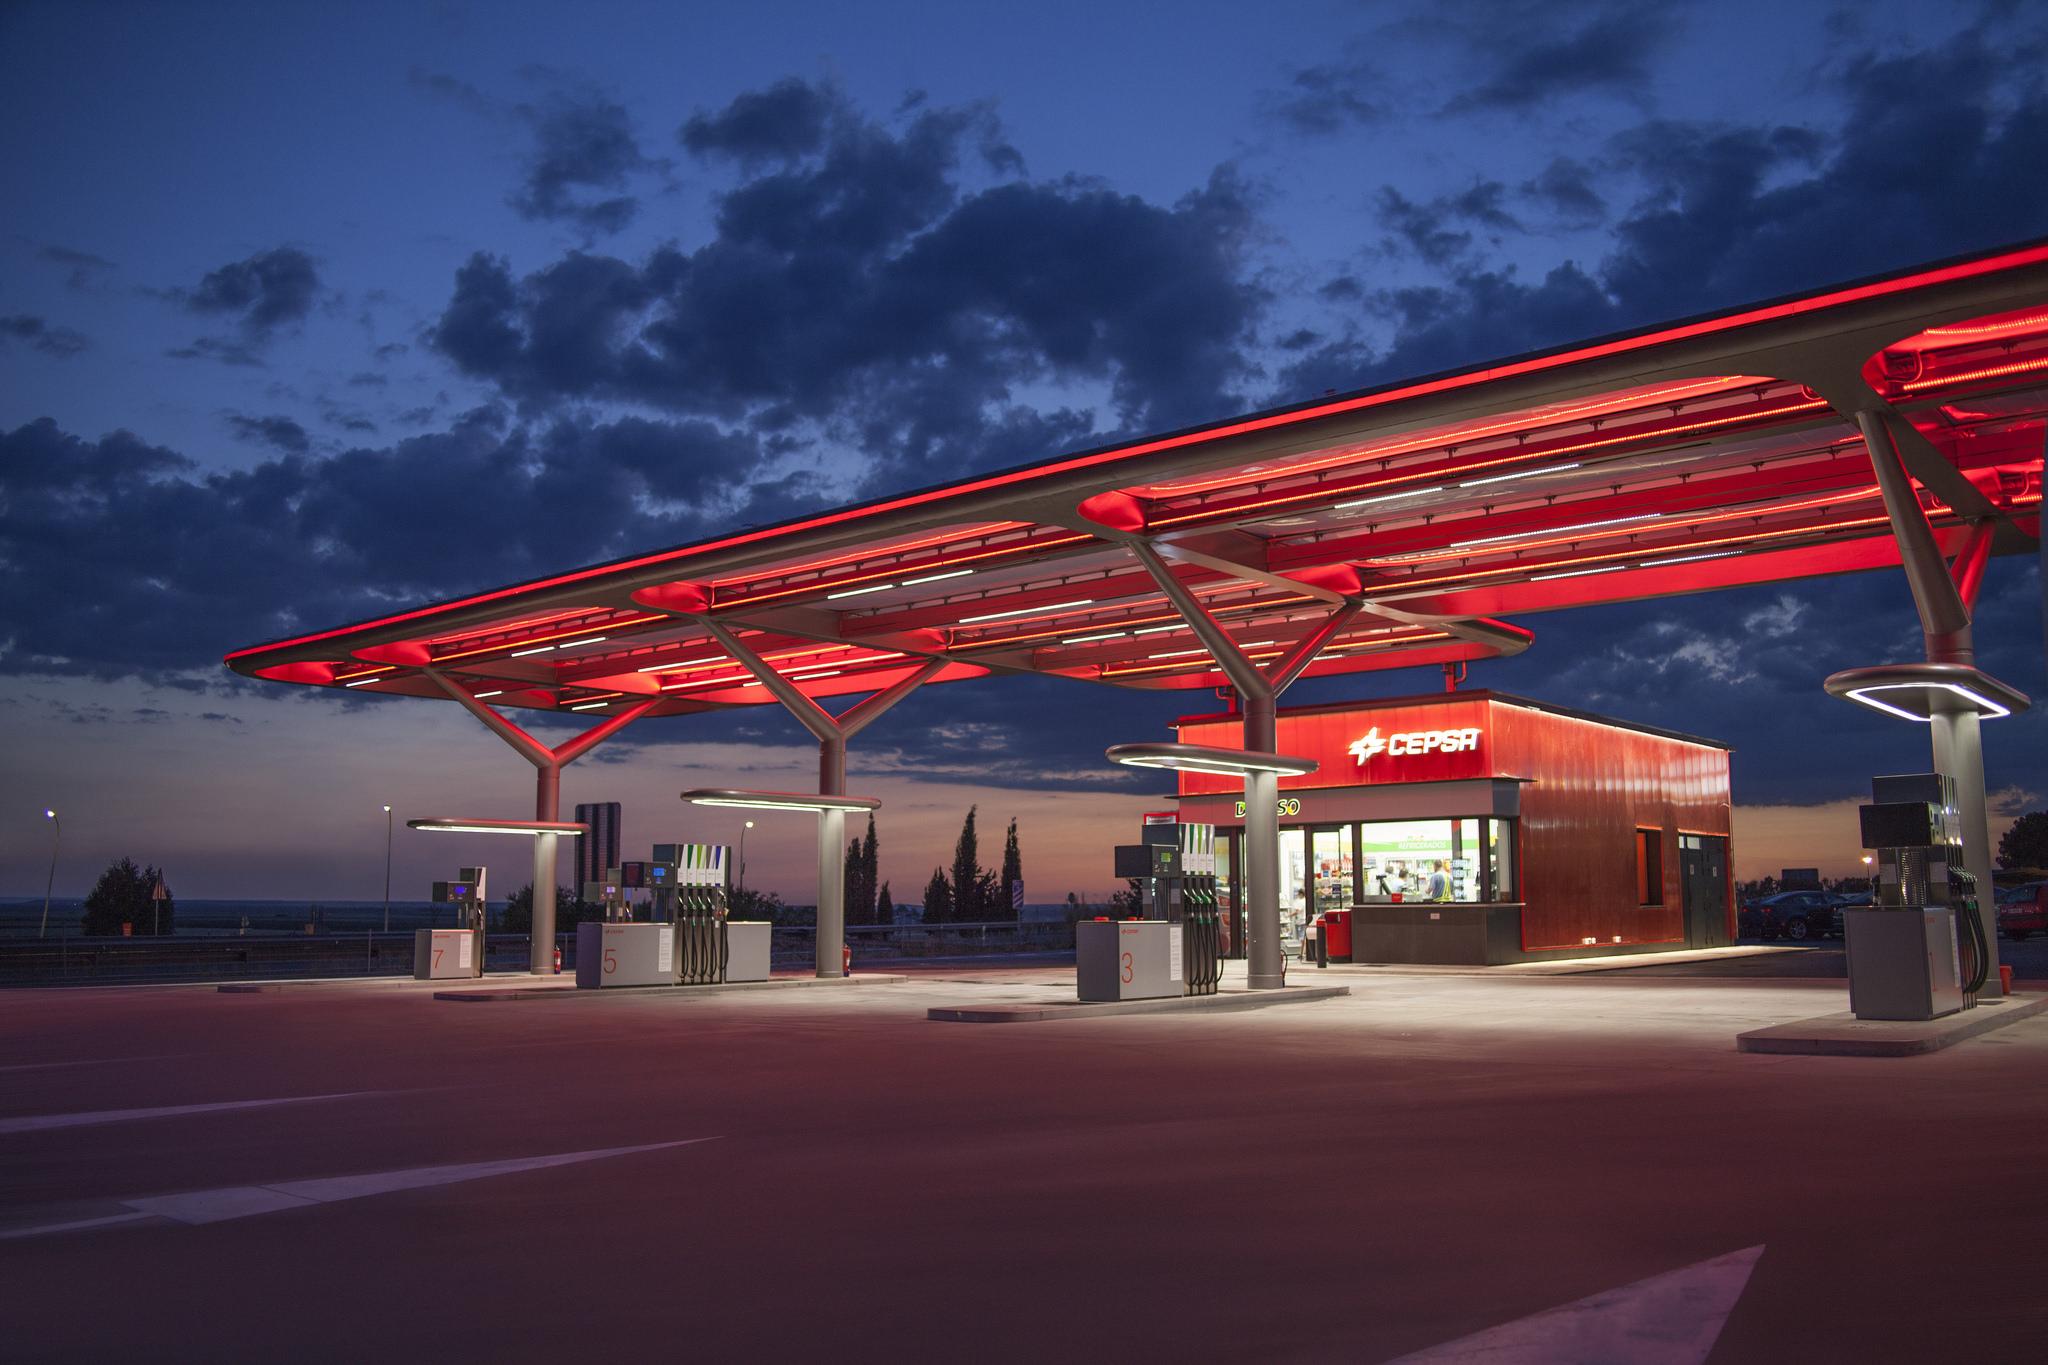 La empresa CEPSA fue adquirida porInternational Petroleum Investment Company, IPIC. Foto: Cepsa.